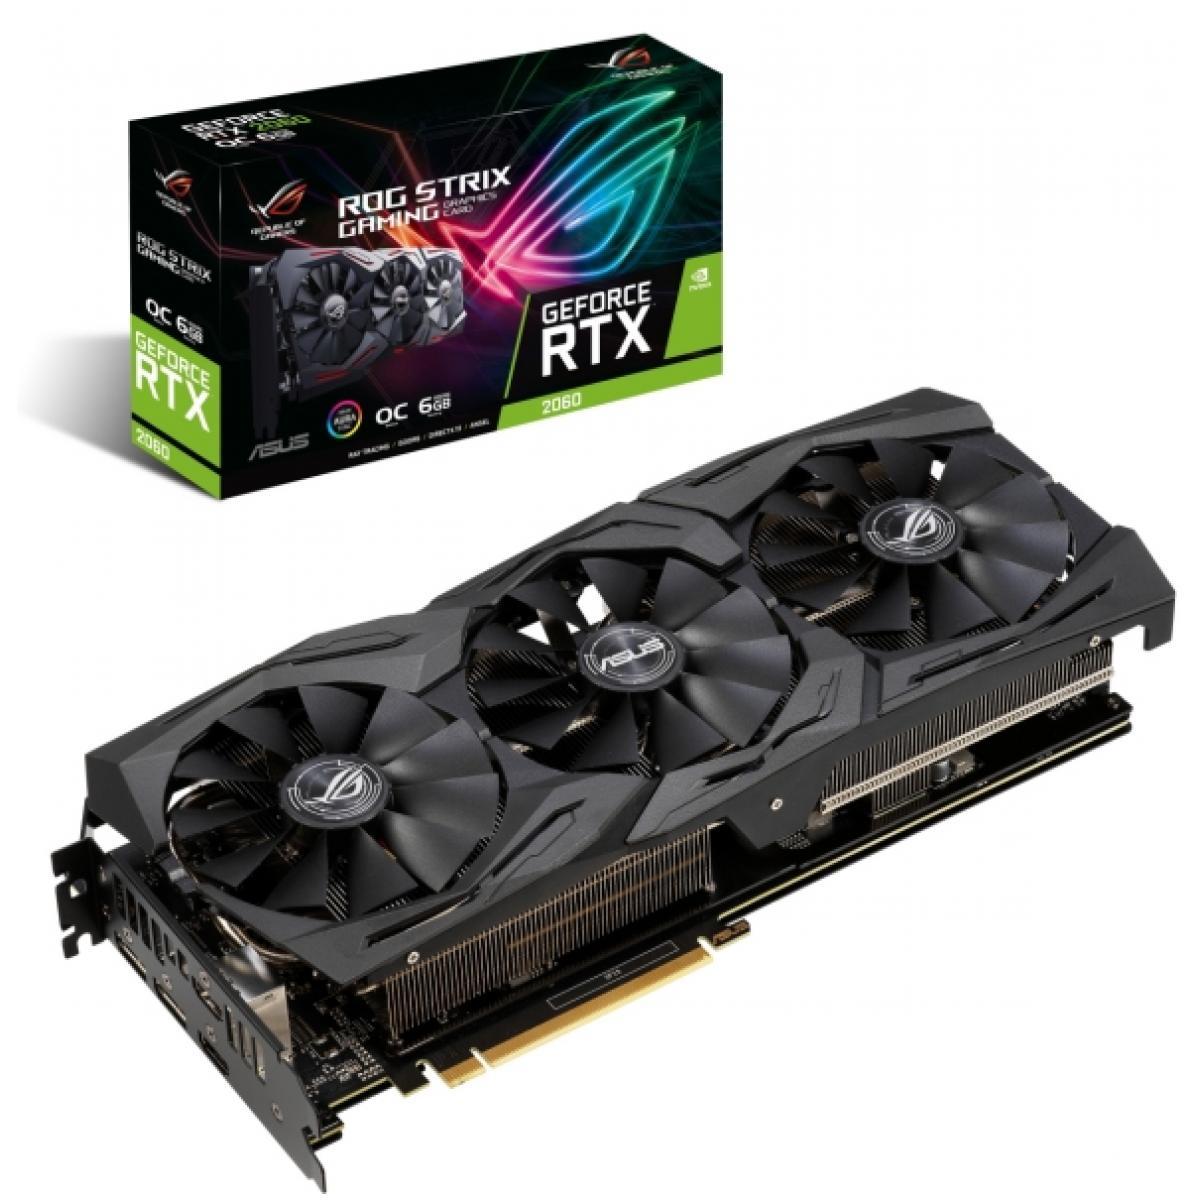 ASUS ROG Strix GeForce RTX 2060 OC 6GB GDDR6